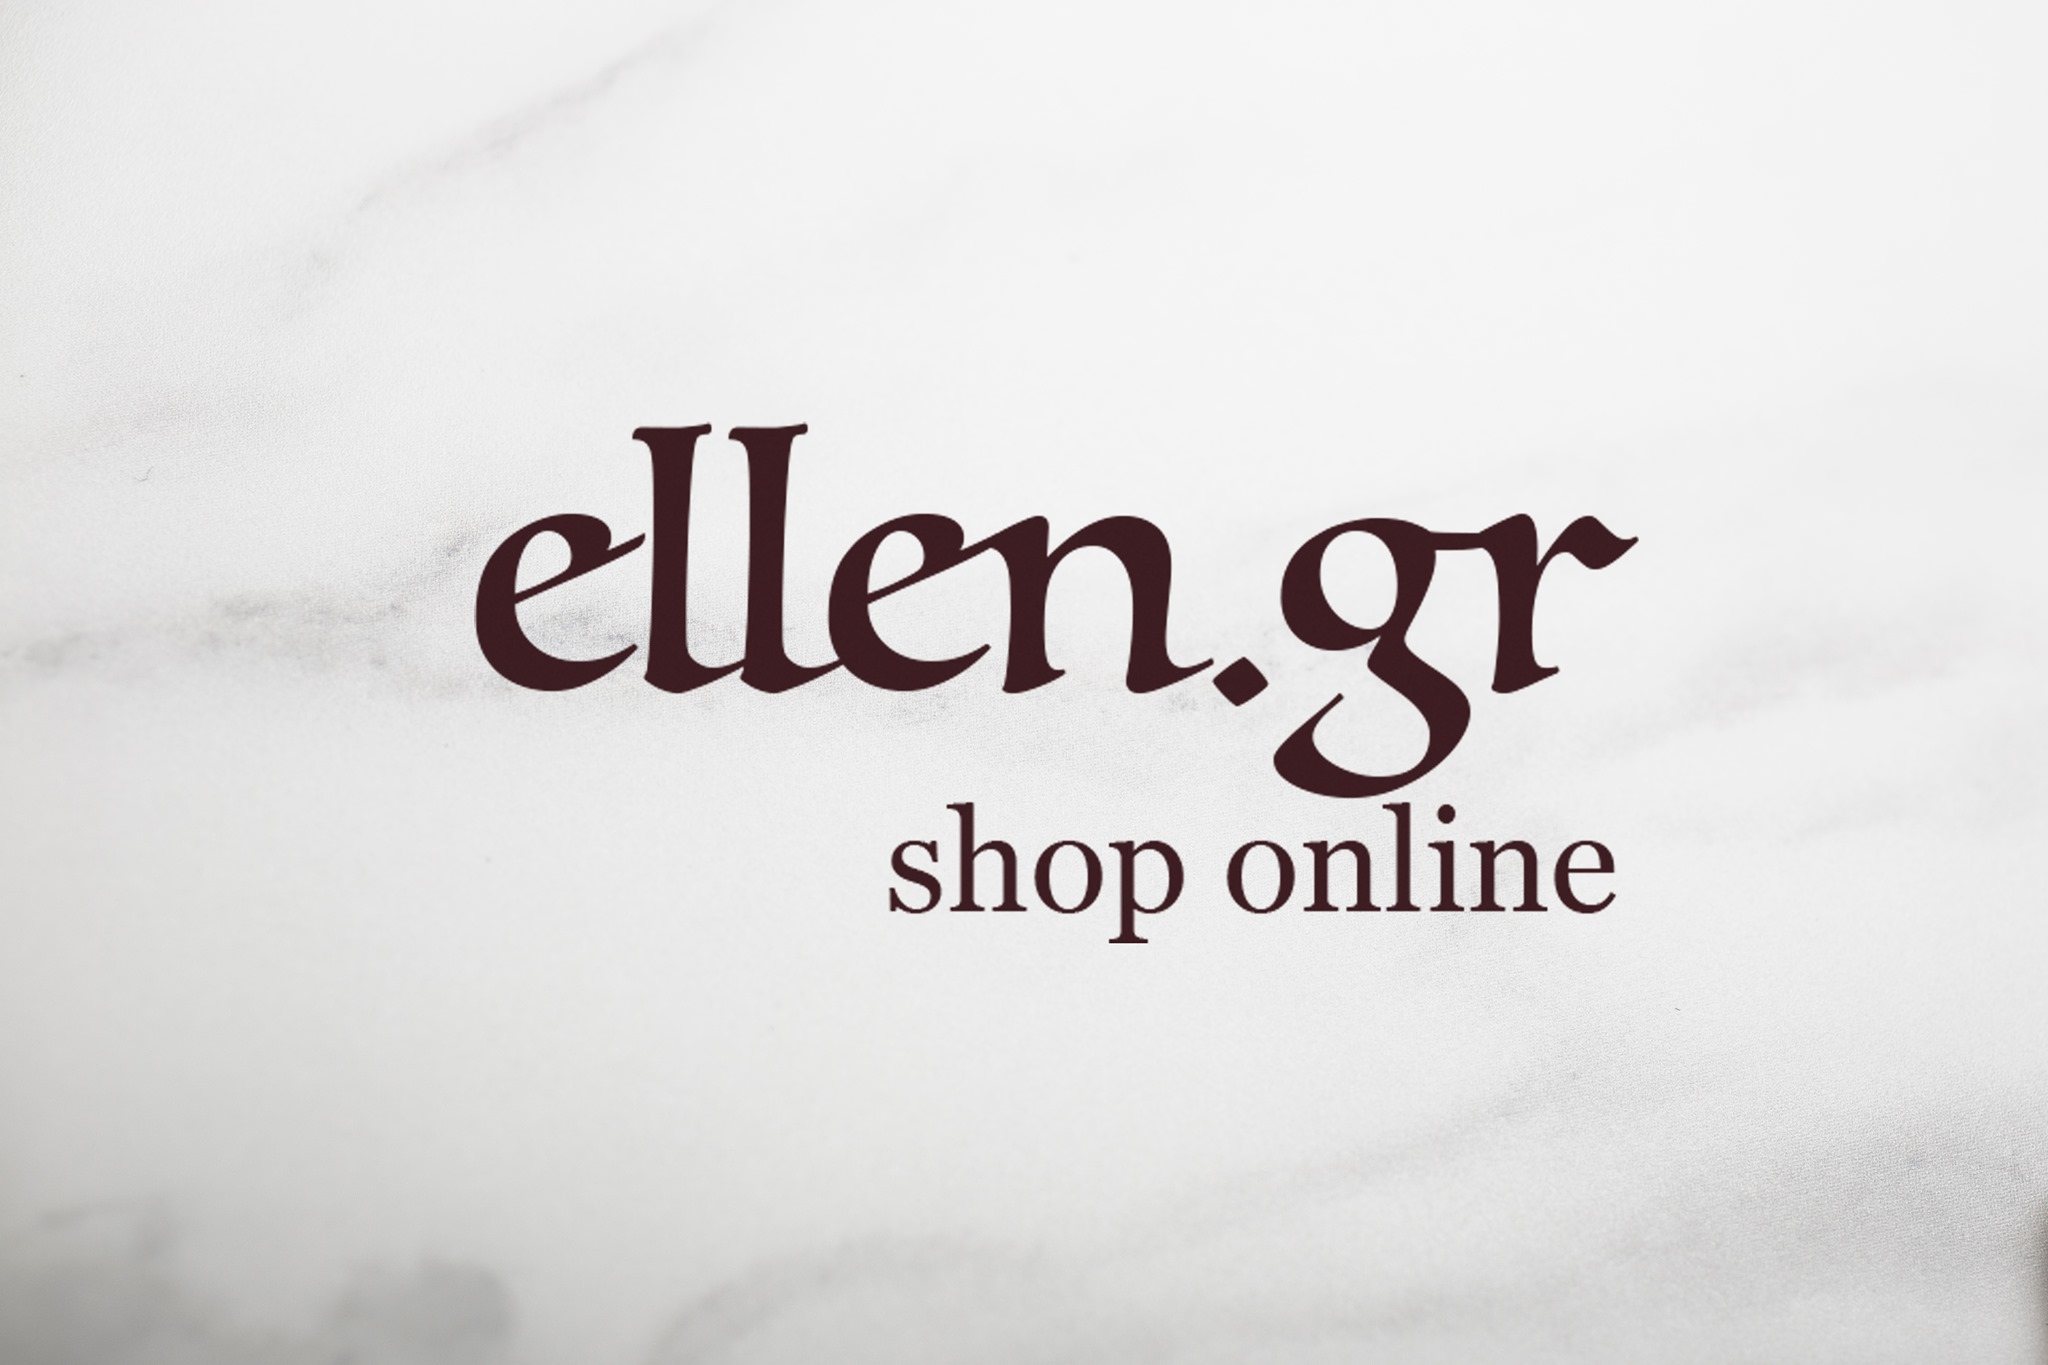 """Ellen.gr Καλωσόρισες στην MyTeam.gr"""